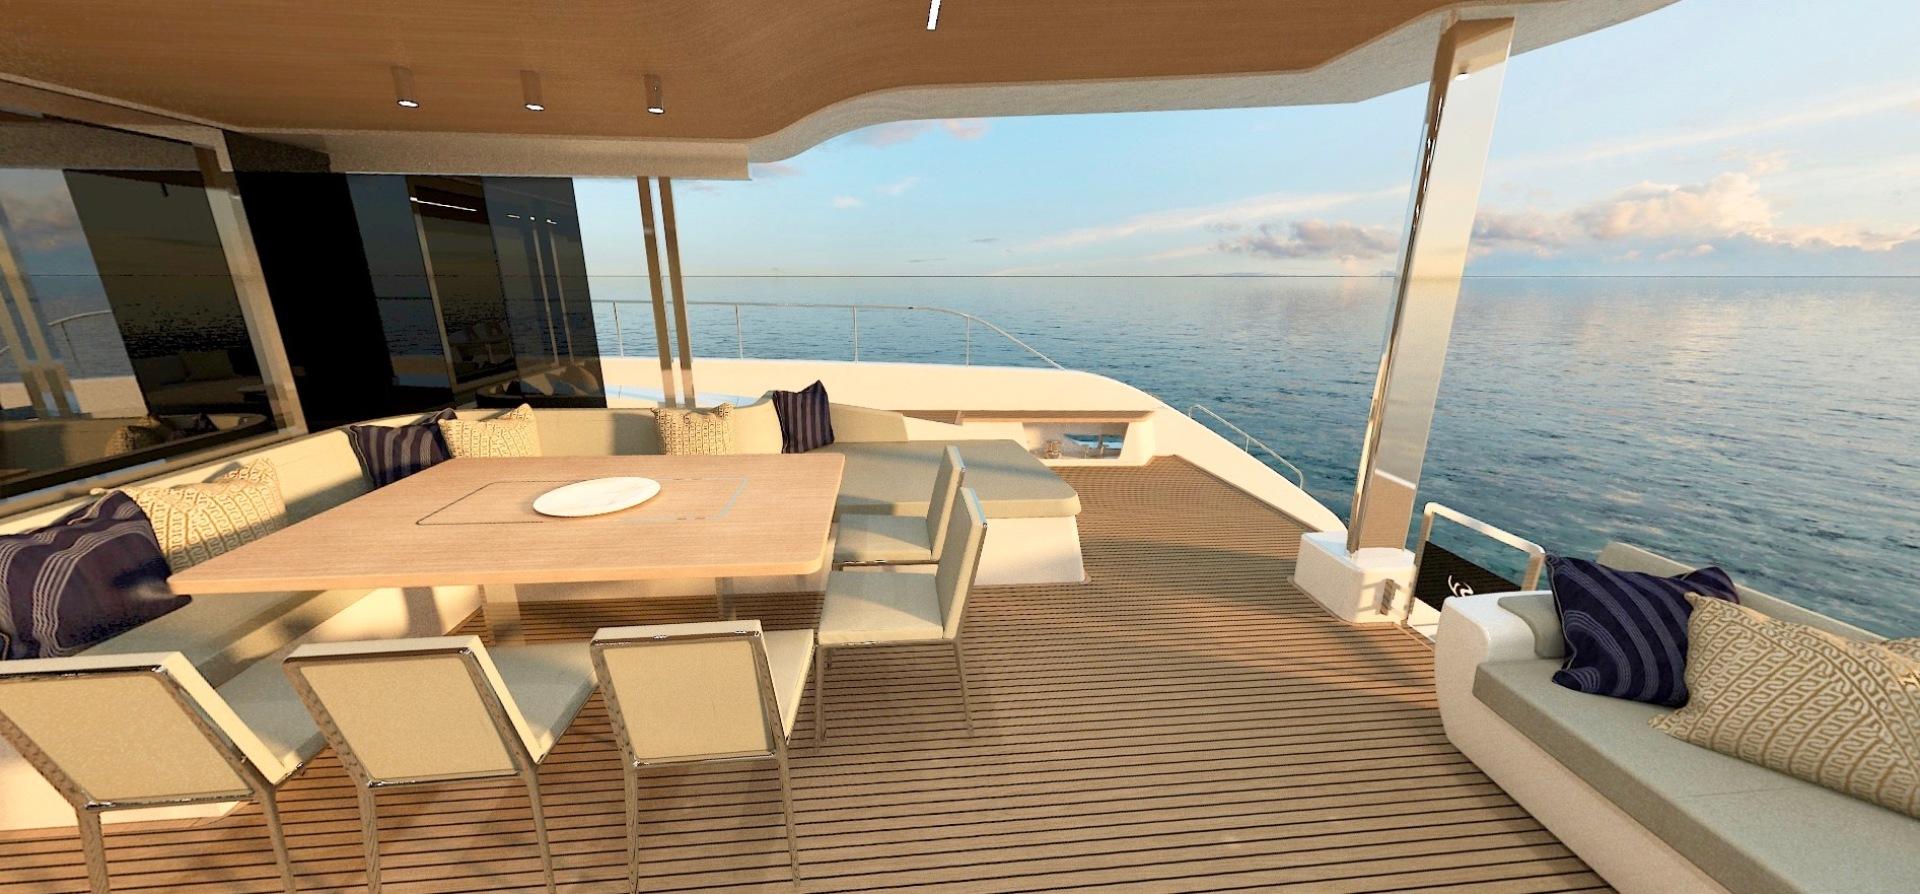 Silent-Yachts-Silent 80  2020-SILENT 80 Ancona-Italy-1262453 | Thumbnail